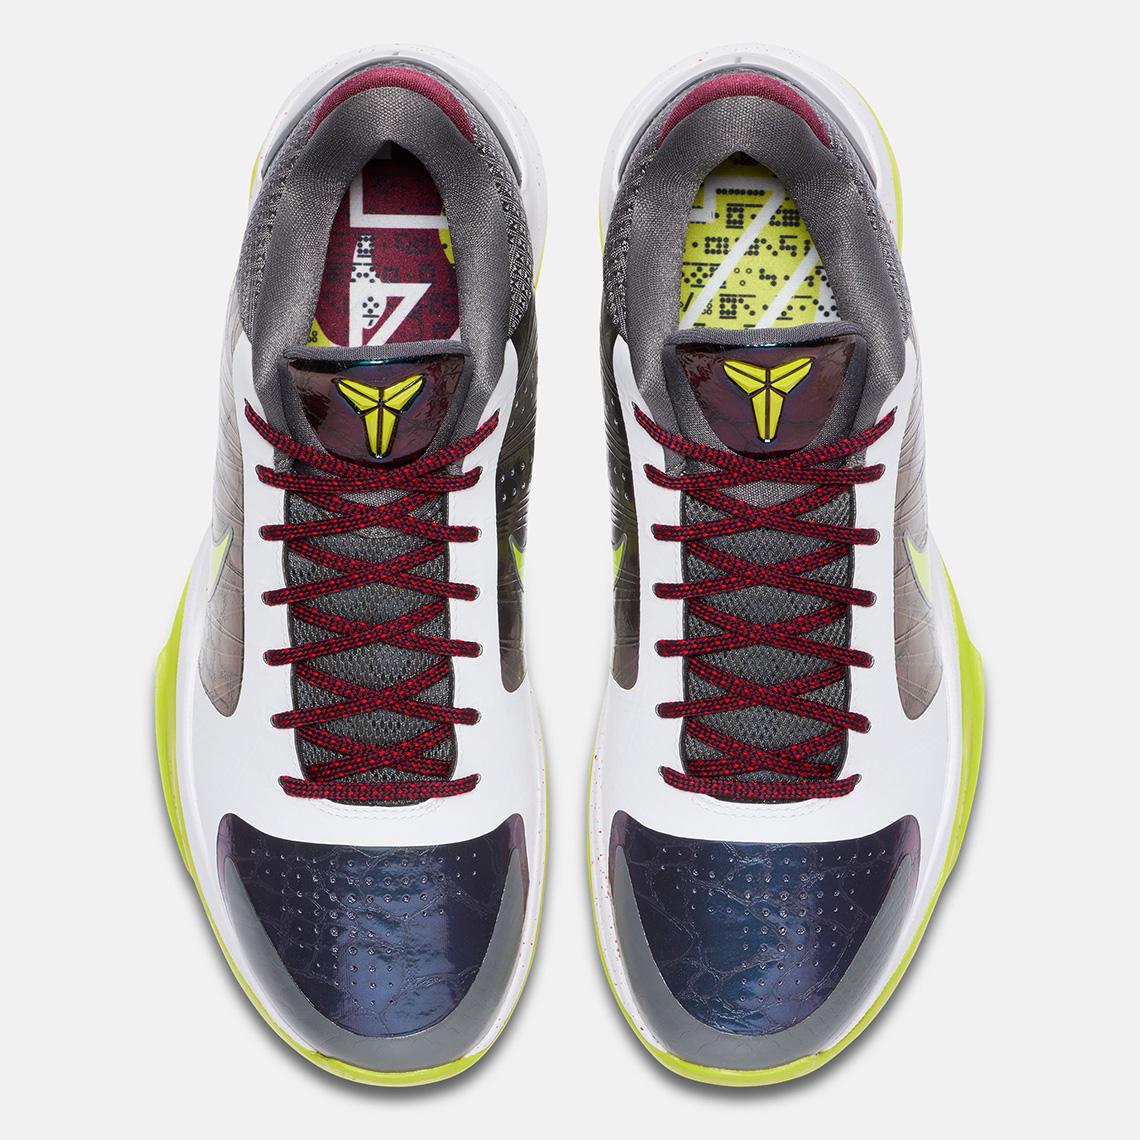 Nike Kobe 5 Protro Chaos Release Date